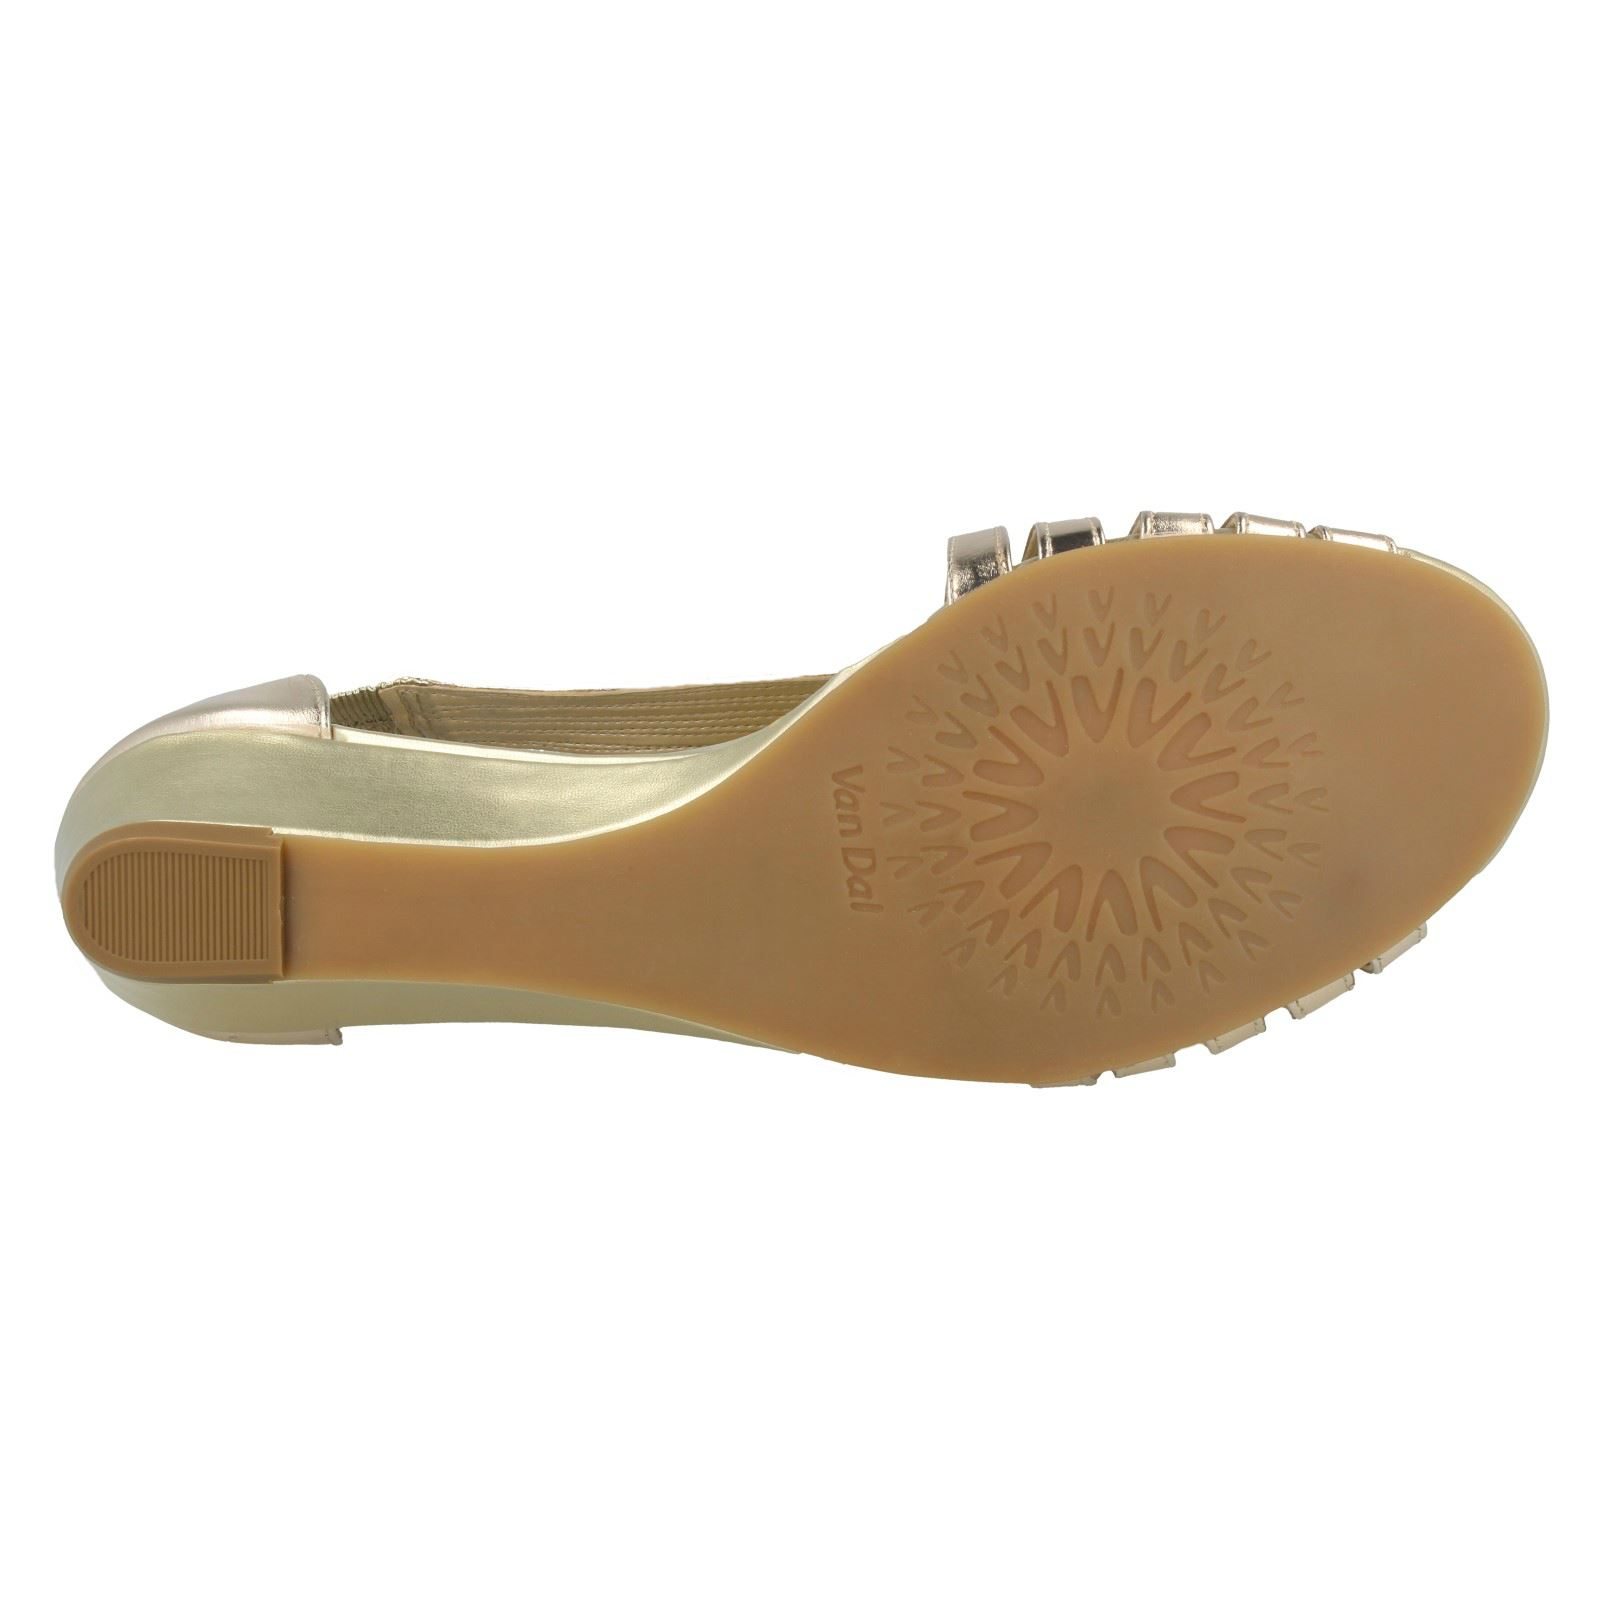 Ladies-Van-Dal-Wedge-Strappy-Sandals-Lucie thumbnail 27